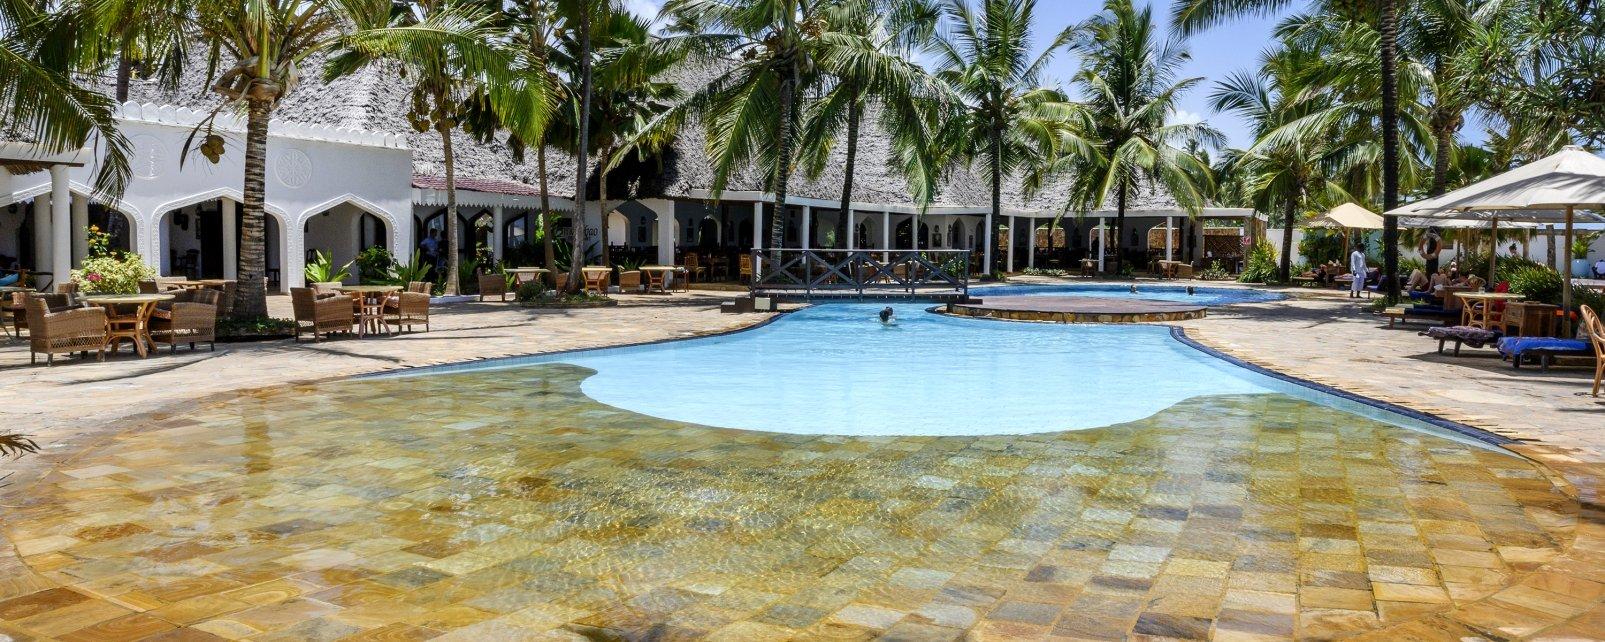 Hôtel Sultan Sands Island Resort